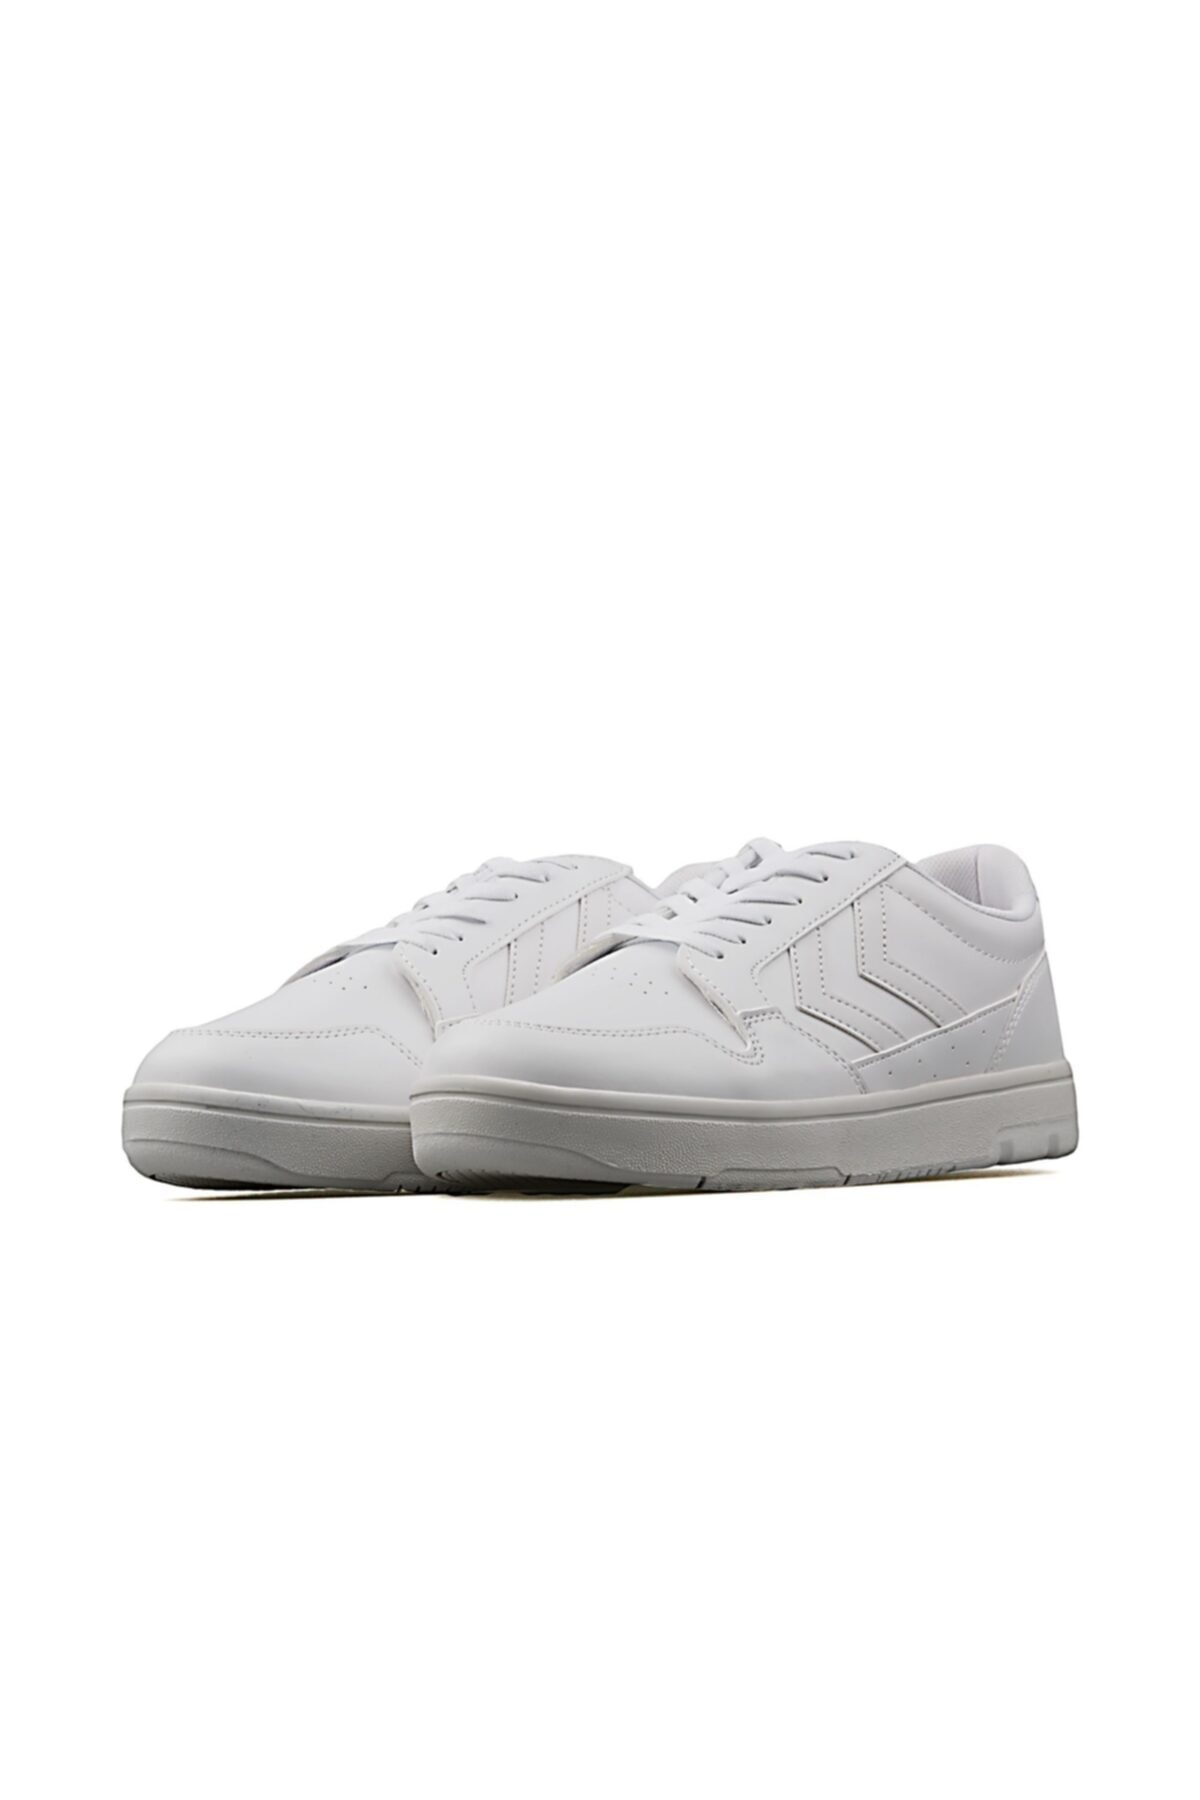 HUMMEL HMLNIELSEN LIFESTYLE SHOE Beyaz Erkek Sneaker Ayakkabı 100550337 1